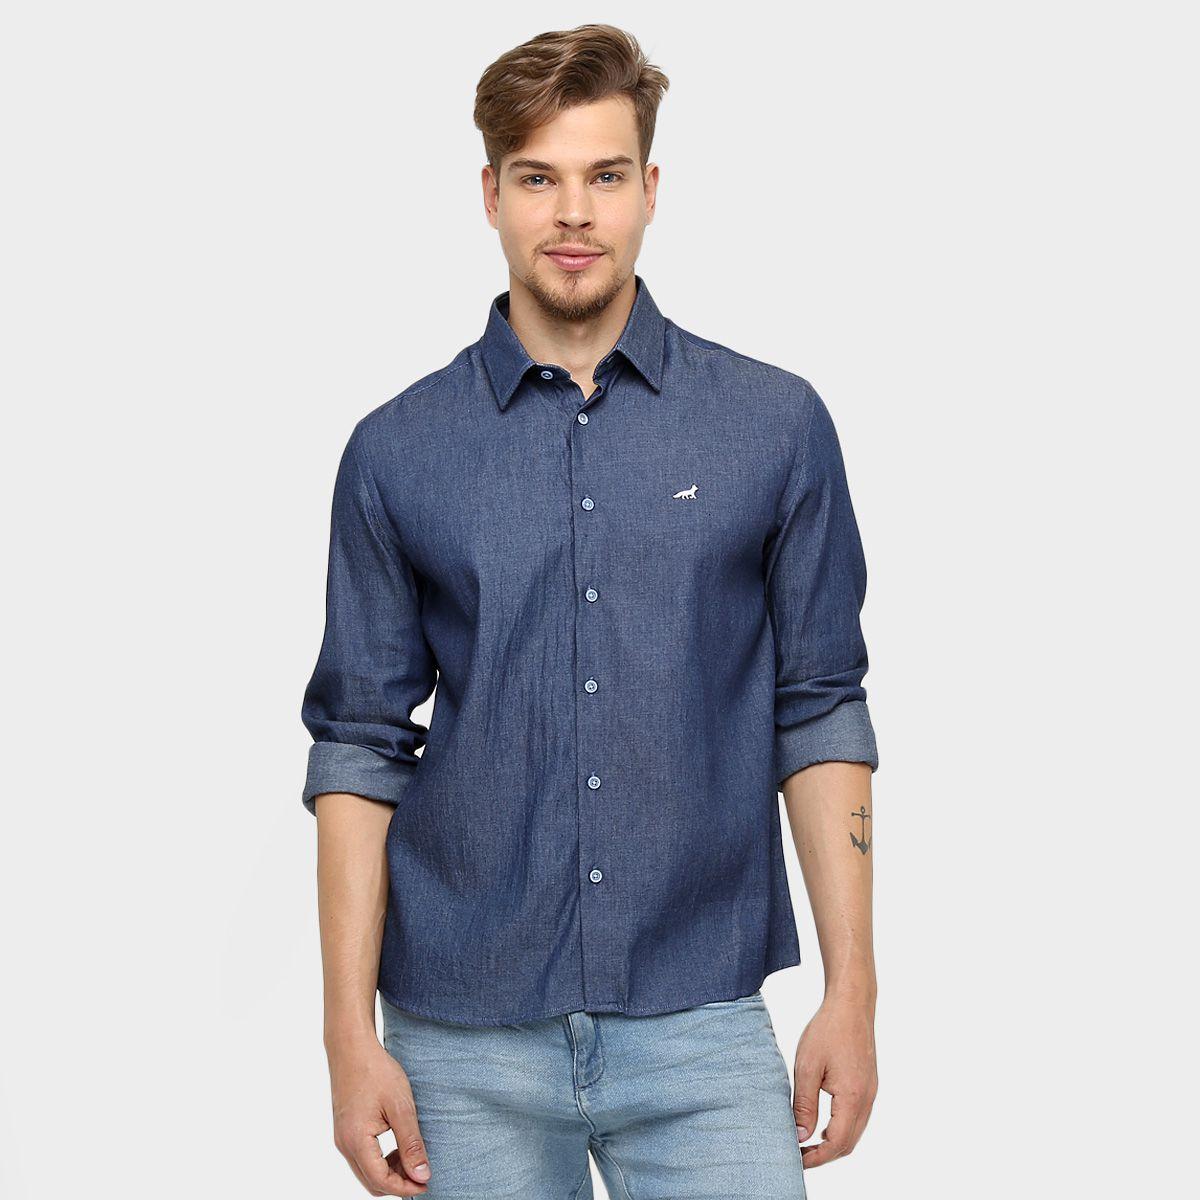 Camisa Masculina Jeans Manga Longa Sem Estampa